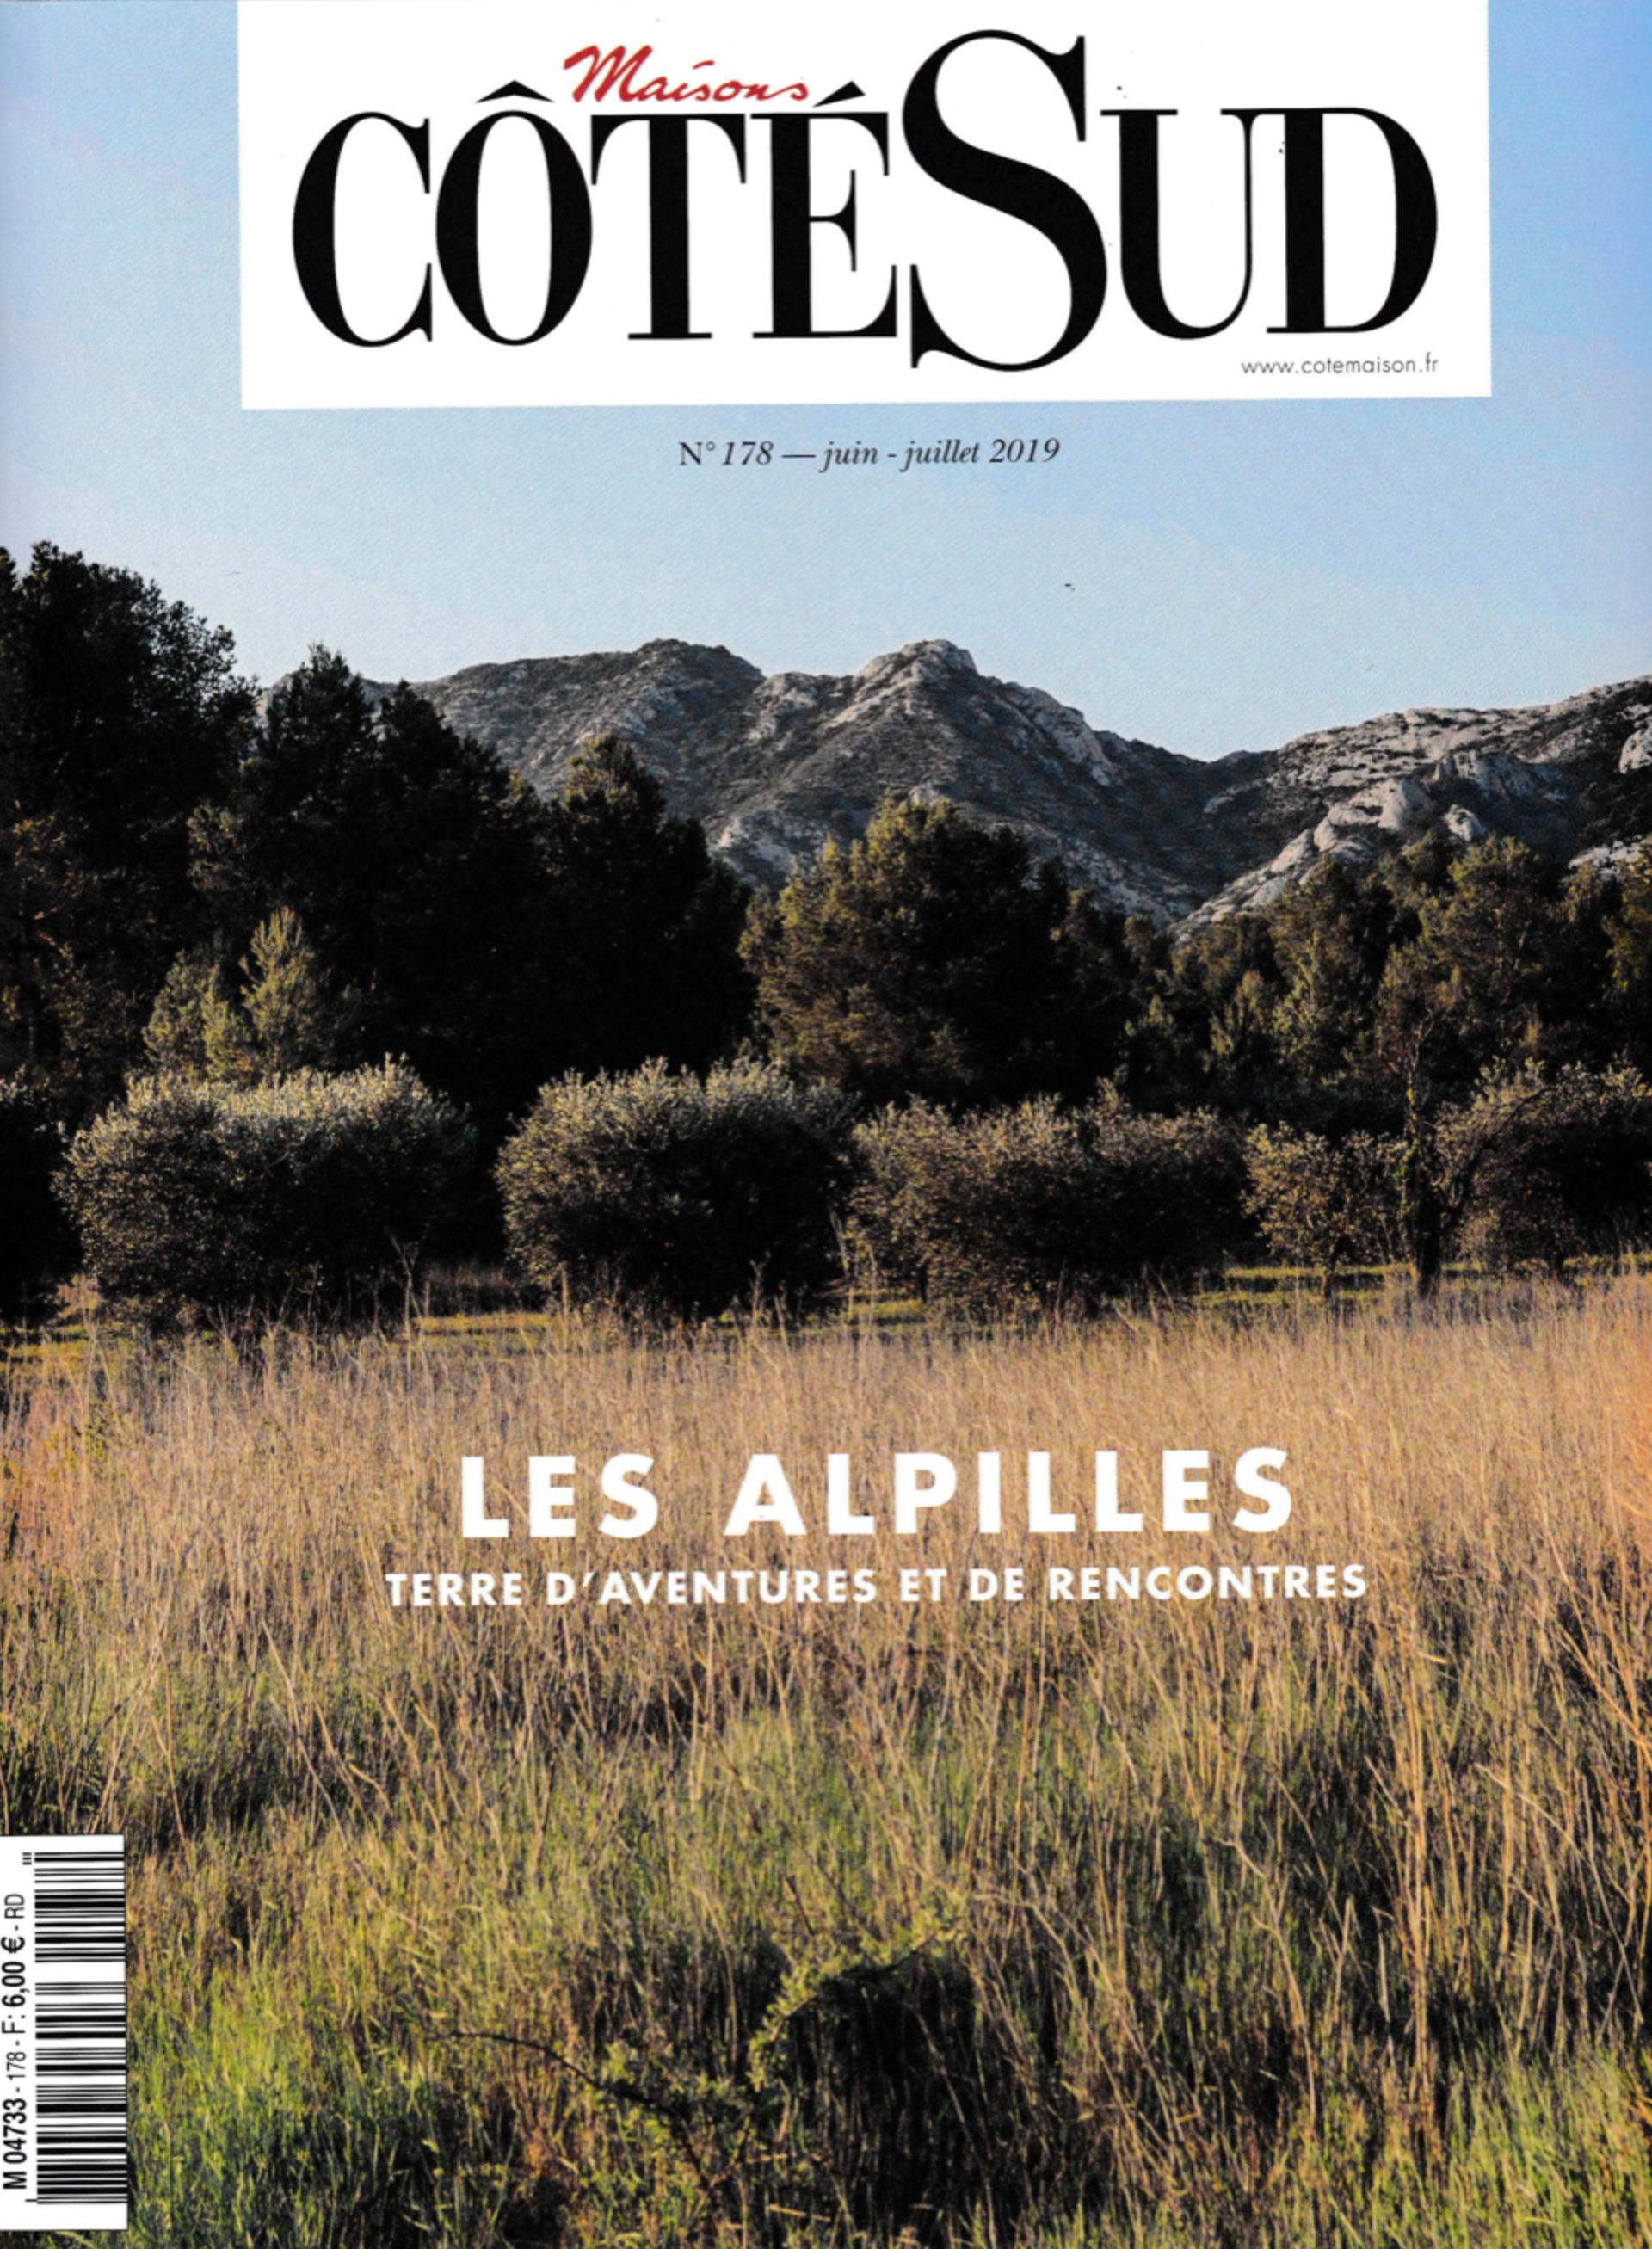 COTE SUD, June/July 2019- Jacques Jarrige